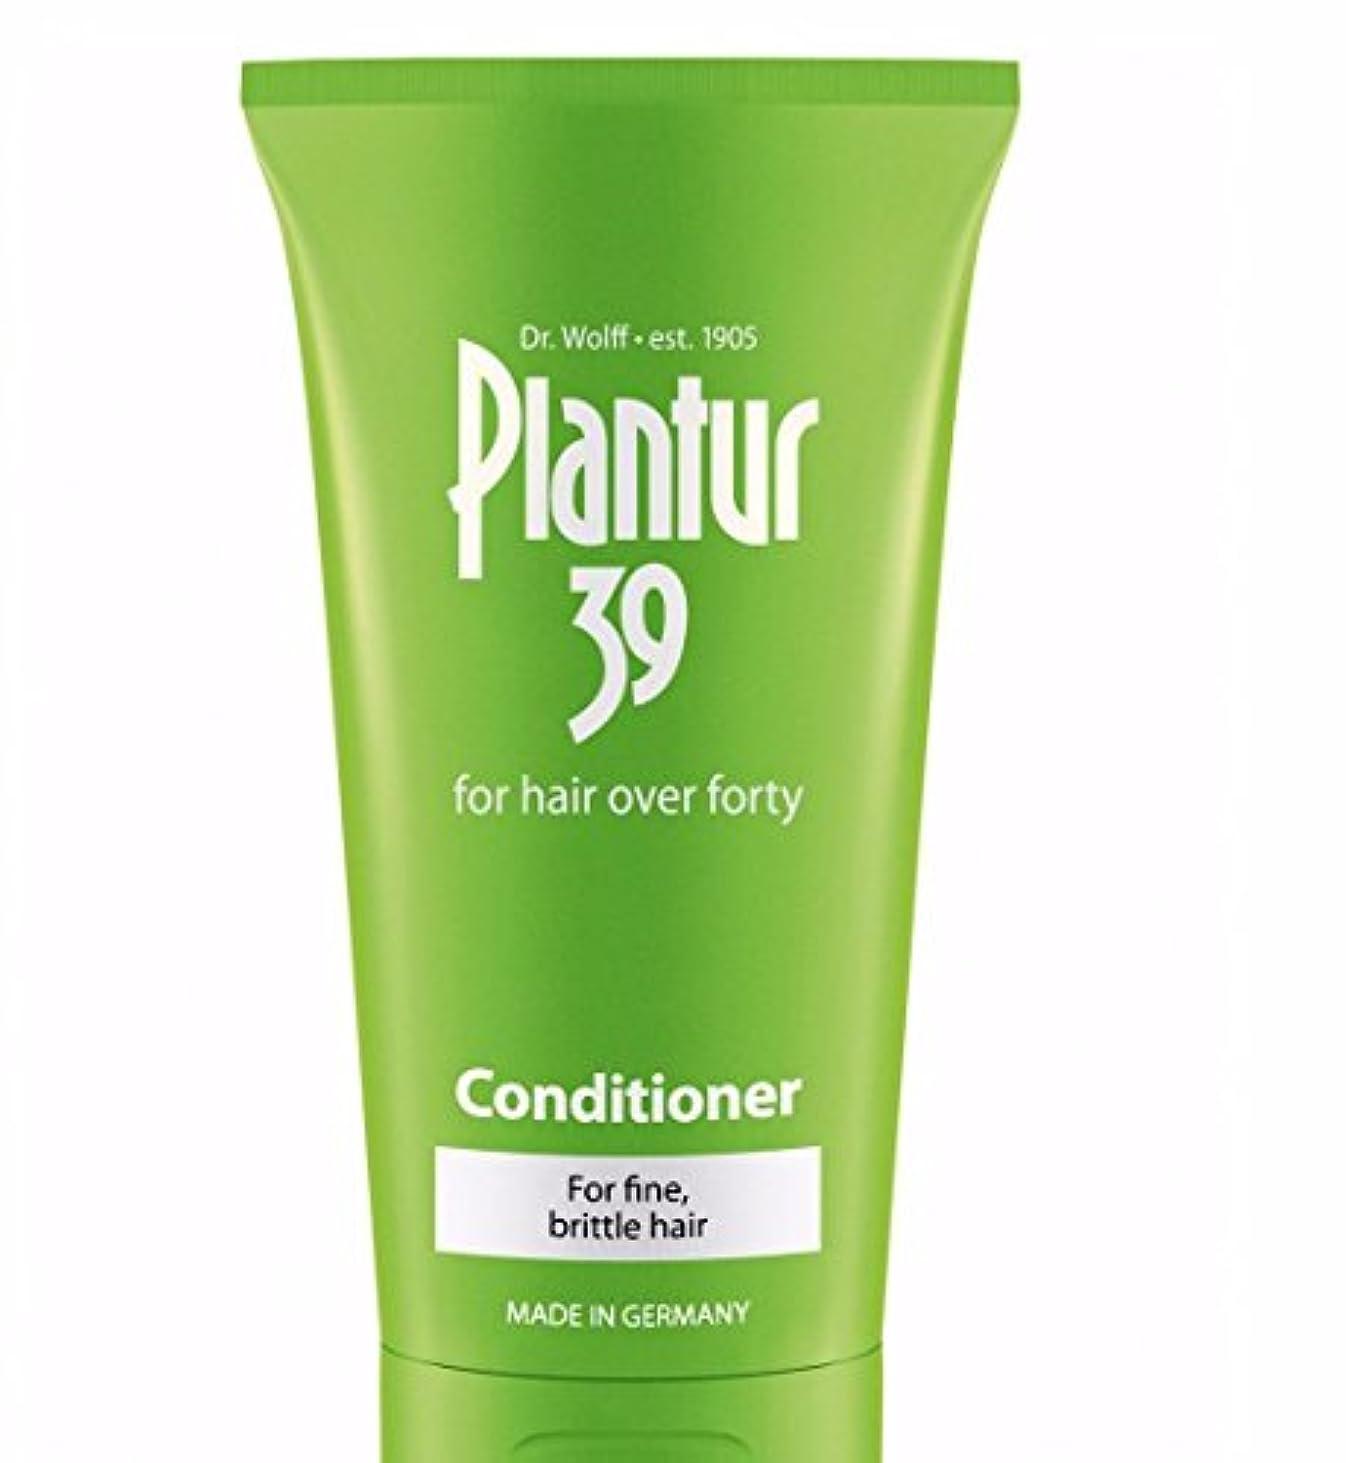 Plantur 37 150ml Strengthening and Moisturizing Conditioner